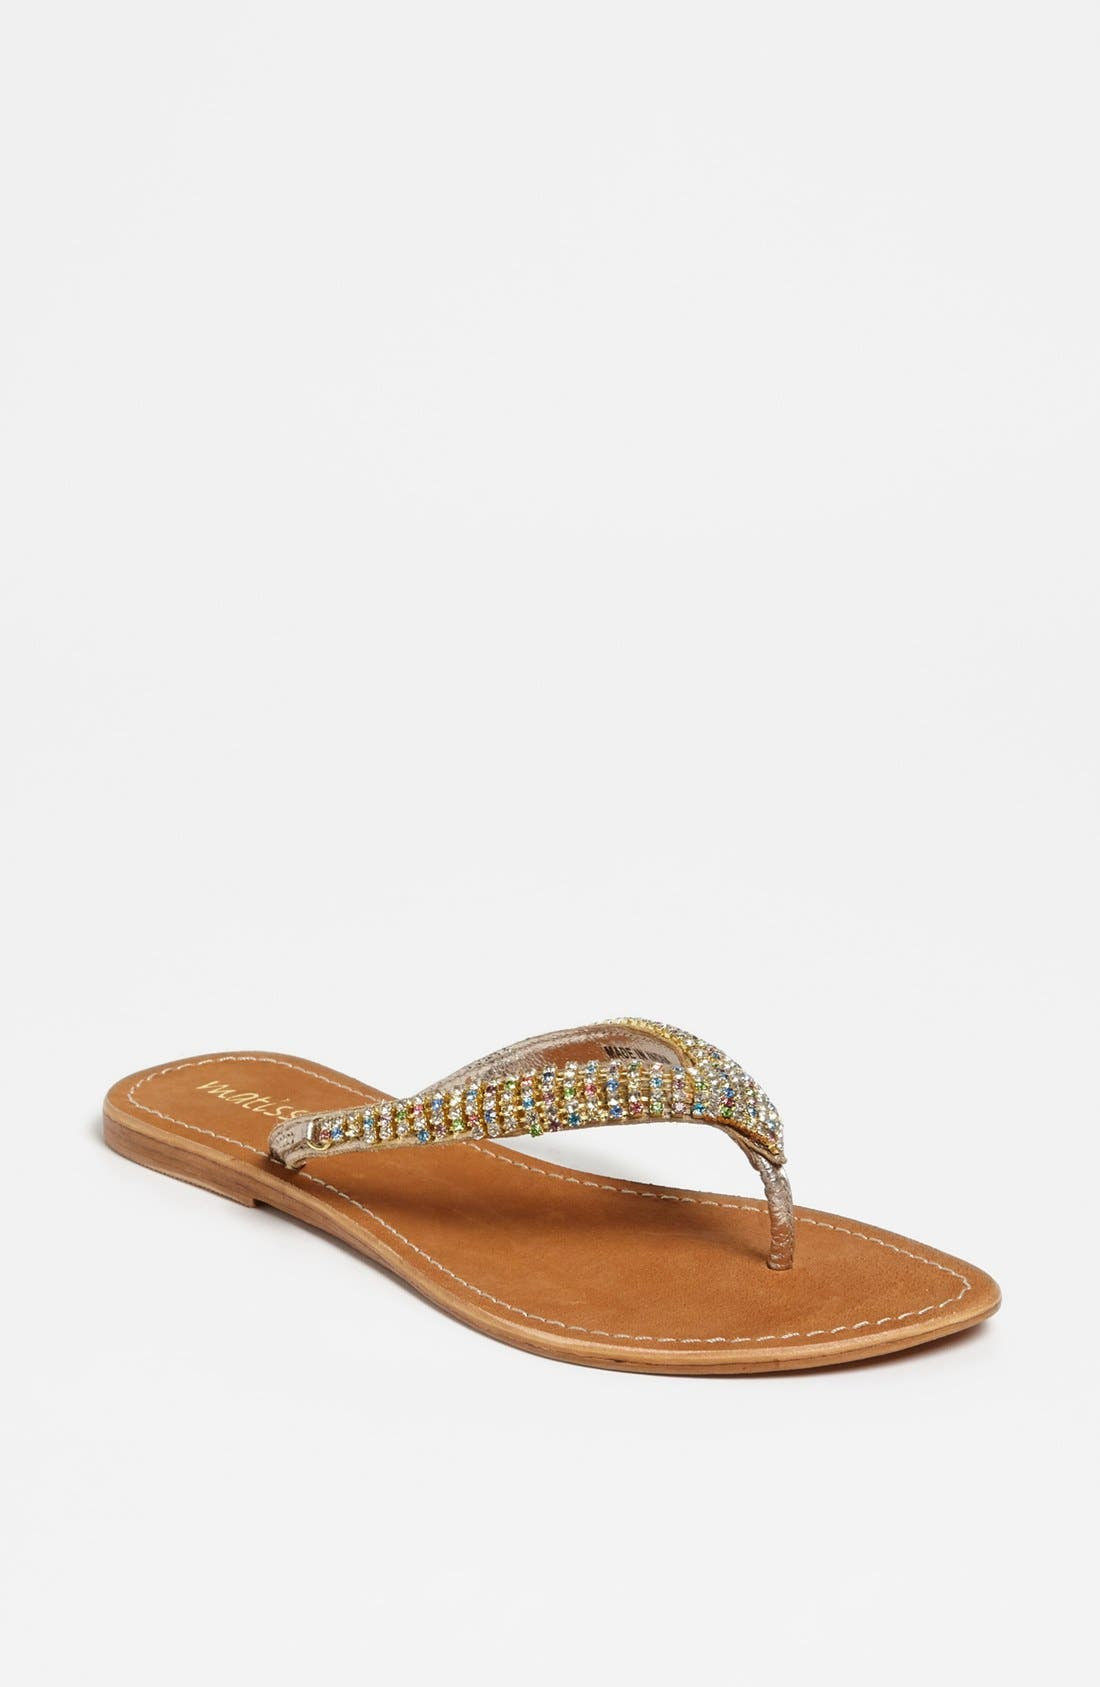 Main Image - Matisse 'Universe' Sandal